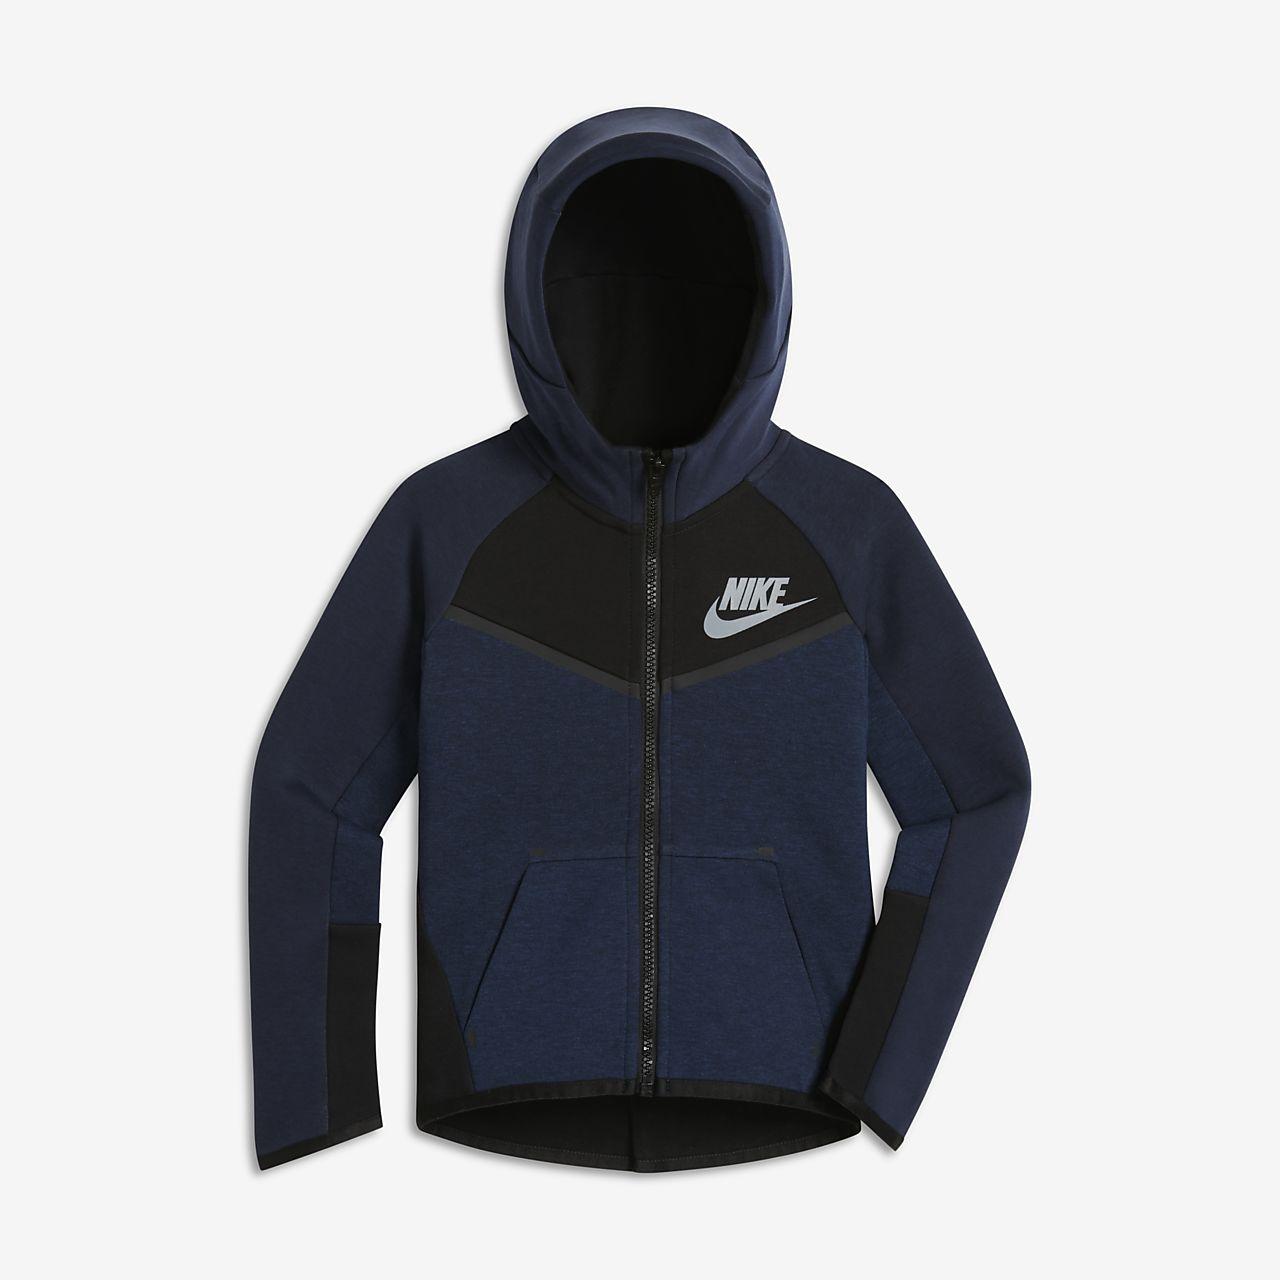 Huvtröja Nike Sportswear Tech Fleece för barn (killar)